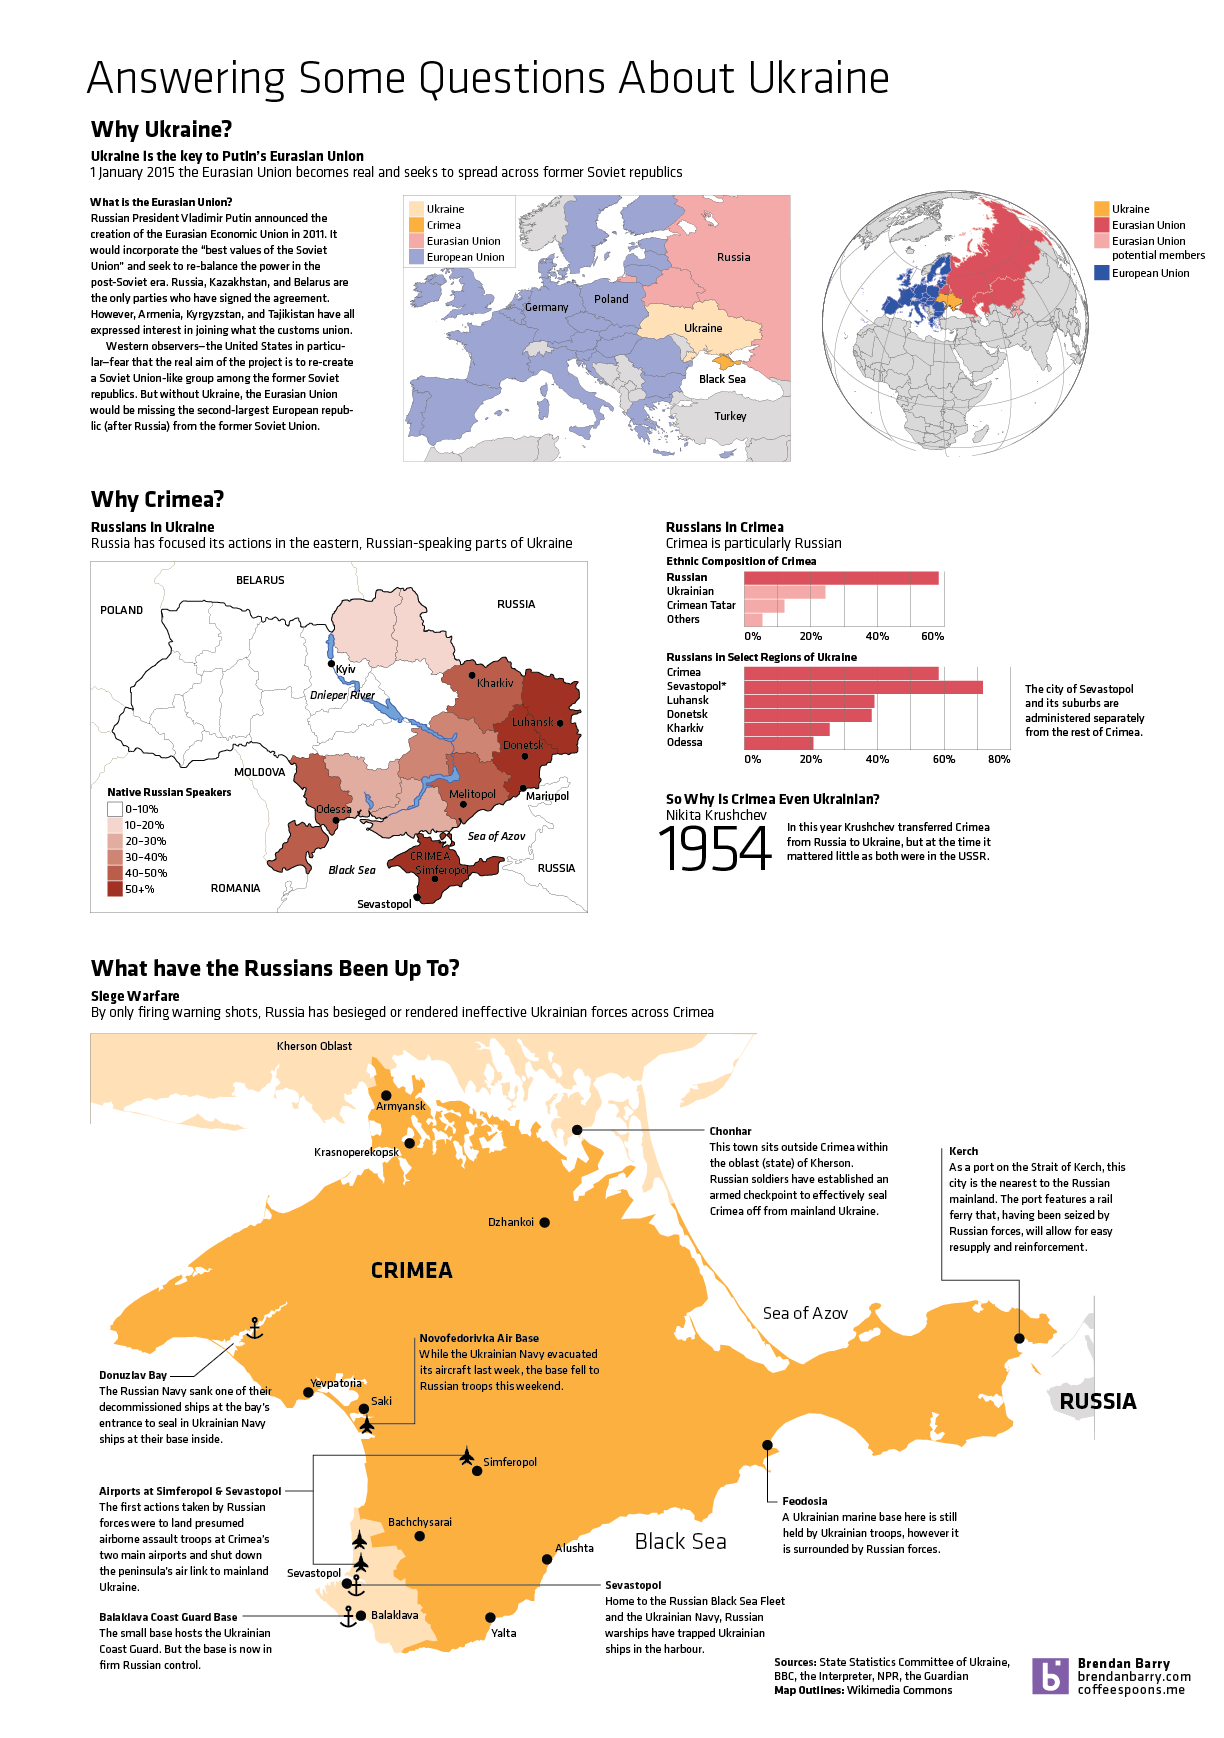 Why Crimea?